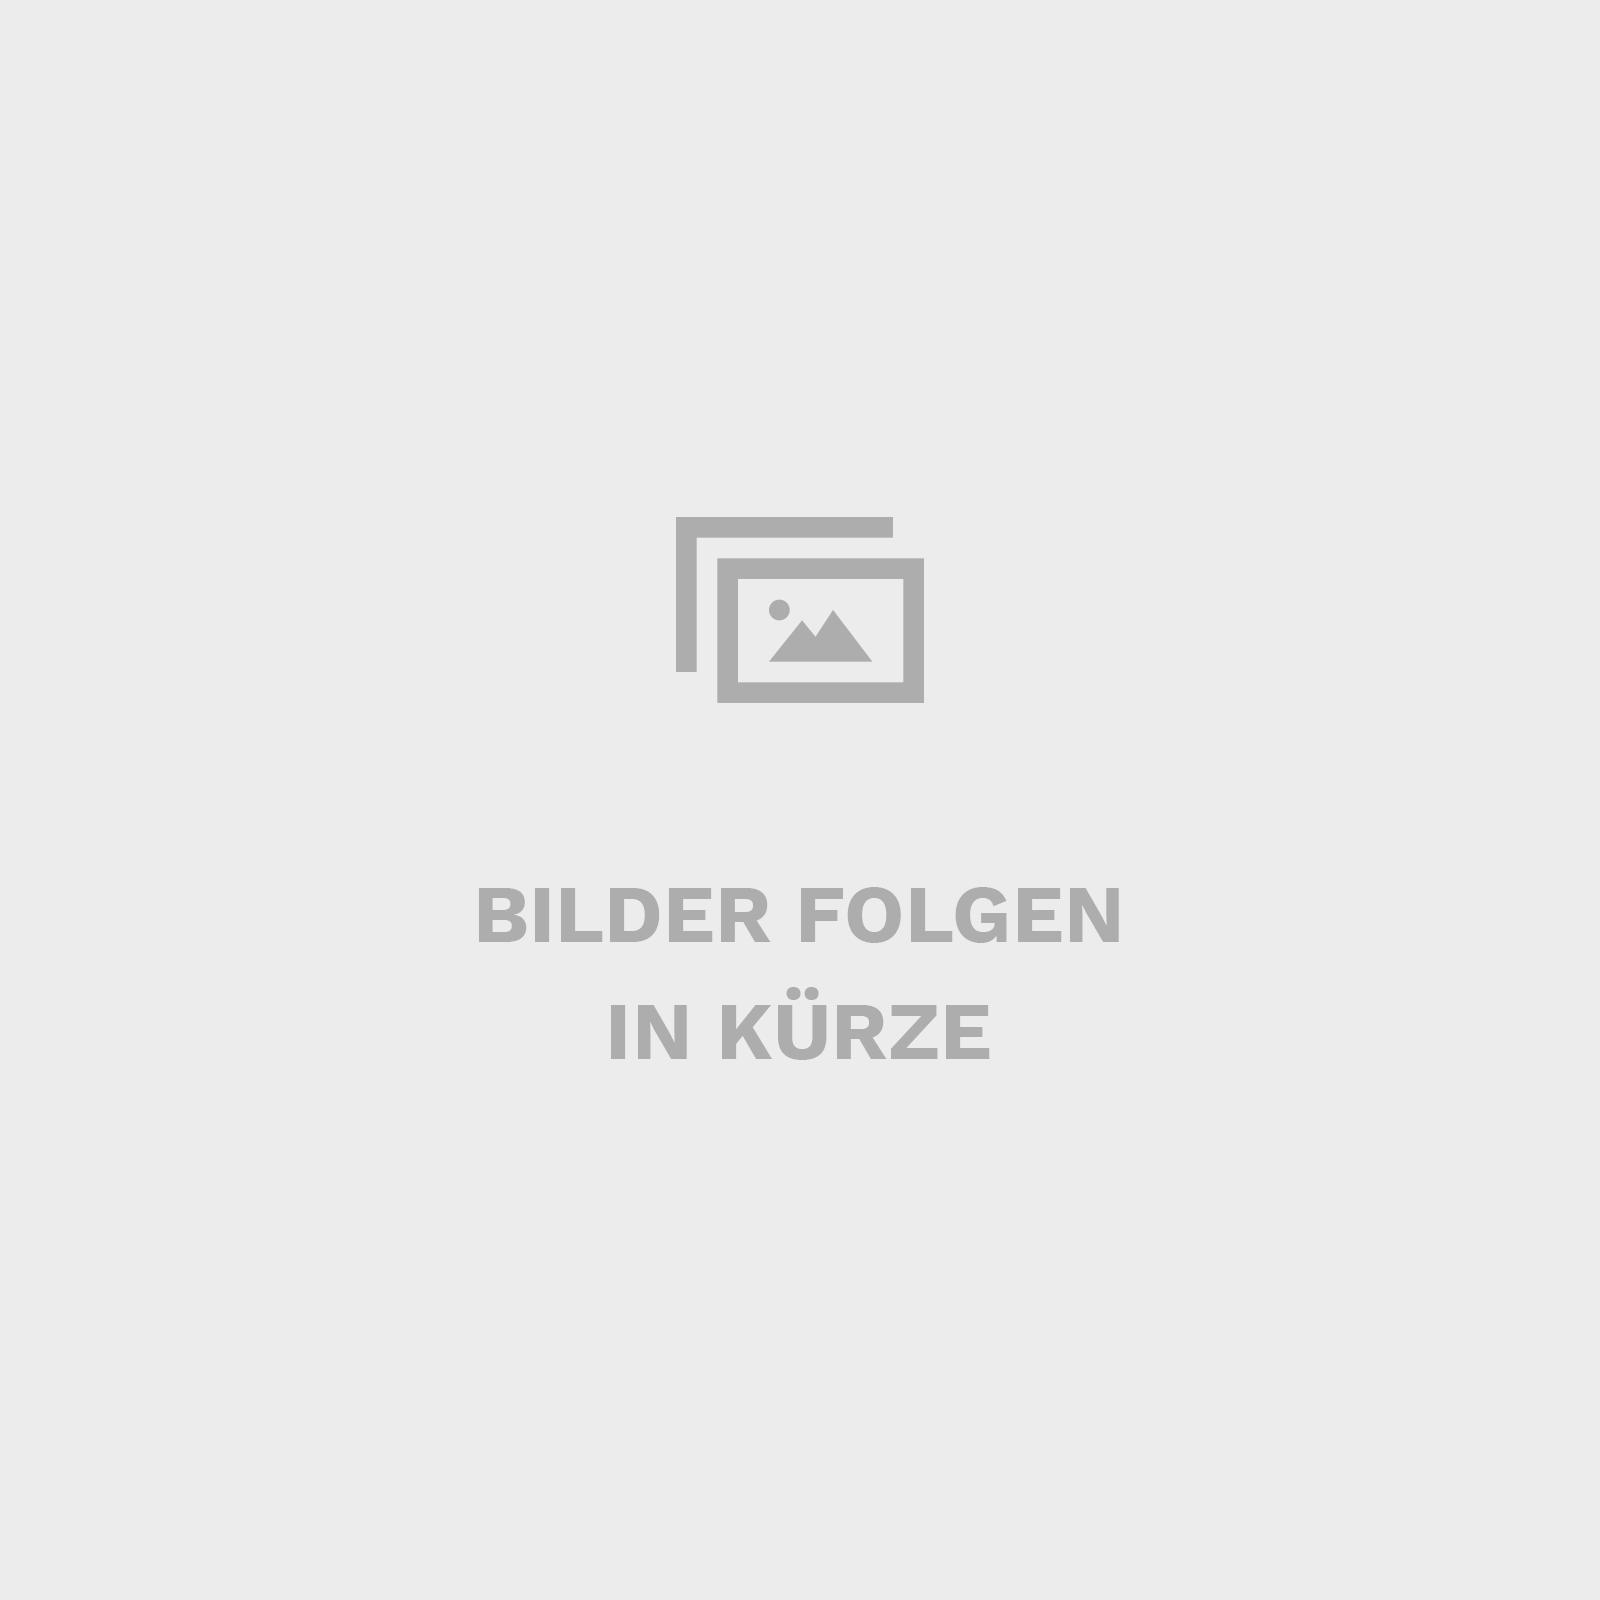 Curling Ceiling - Glasschirm klar/ Reflektor zylindrisch opal